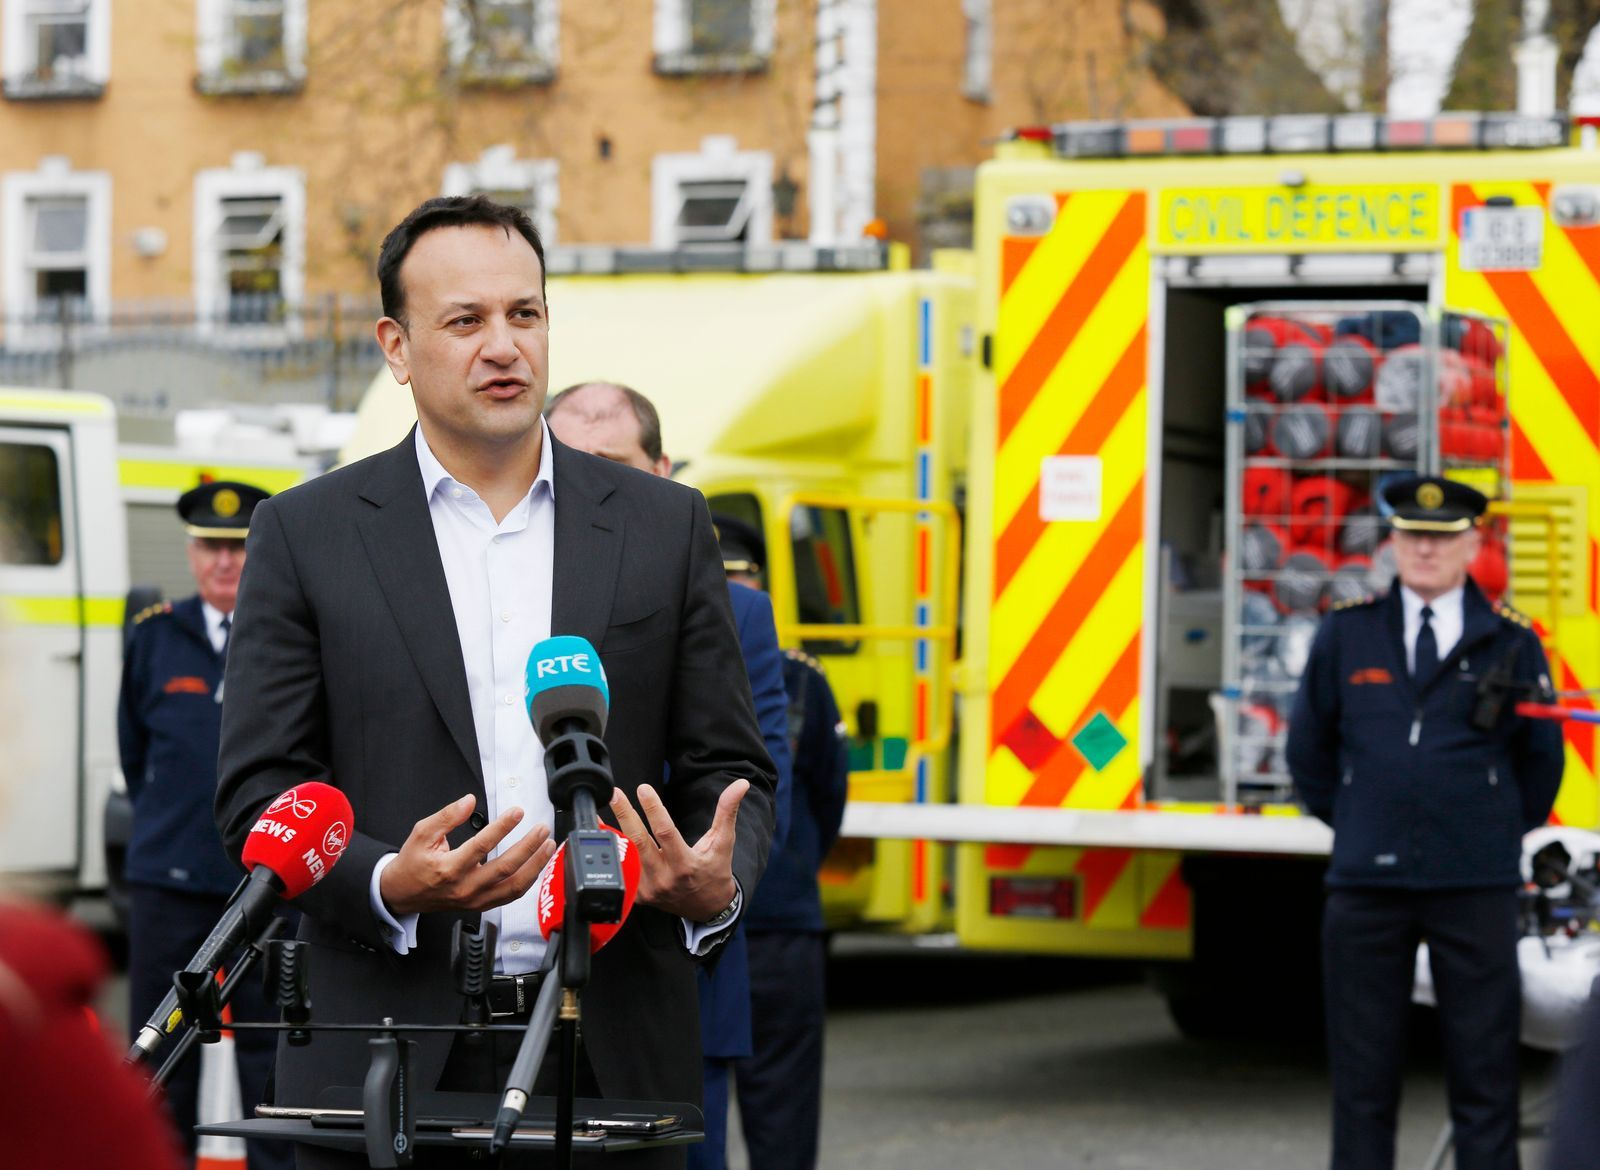 An Taoiseach Varadkar visits Civil Defence, Dublin, Ireland - 20 Apr 2020